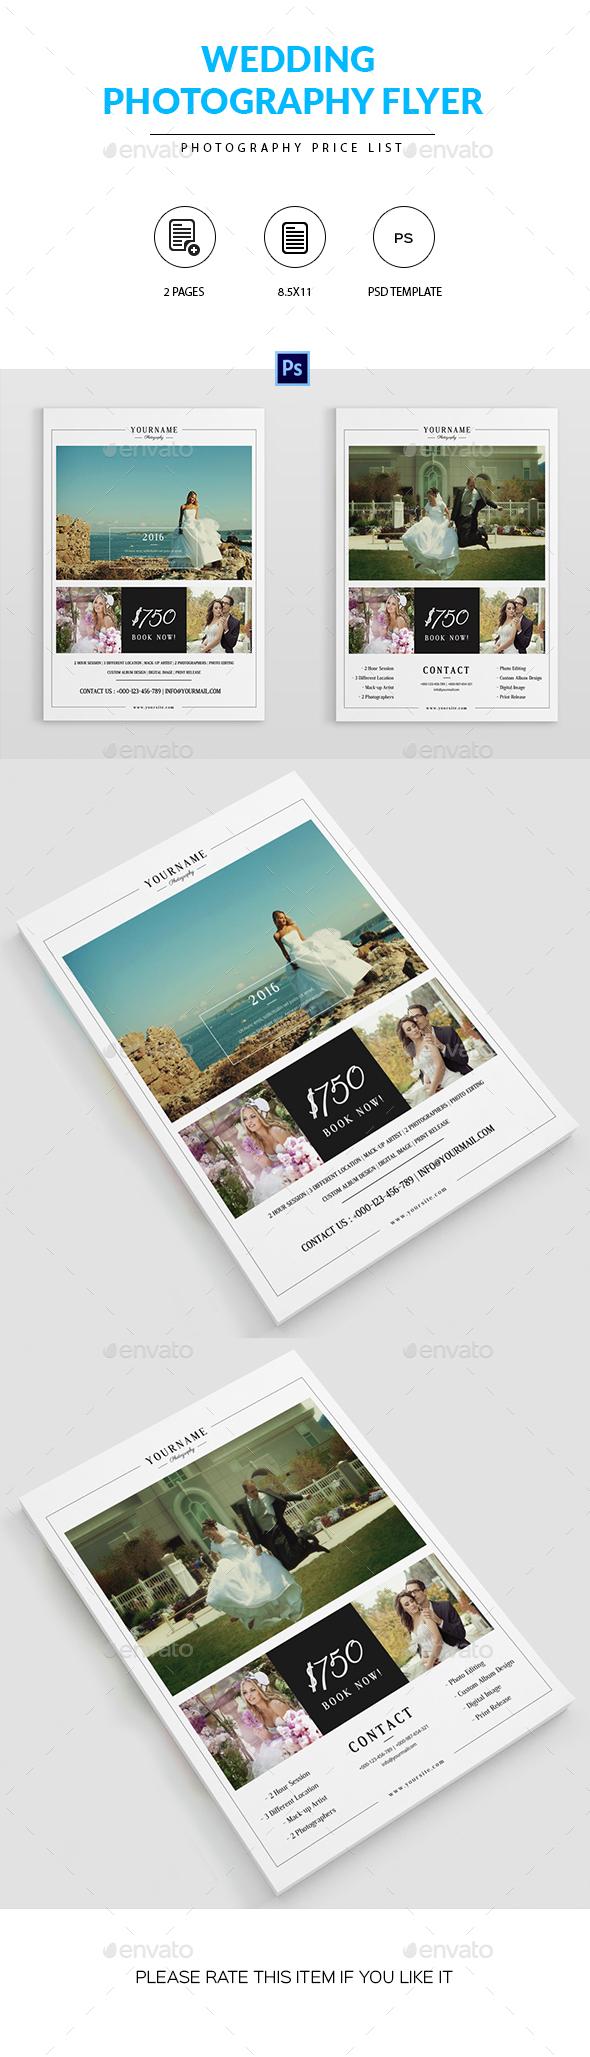 Wedding Photography Pricelist Flyer - Corporate Flyers